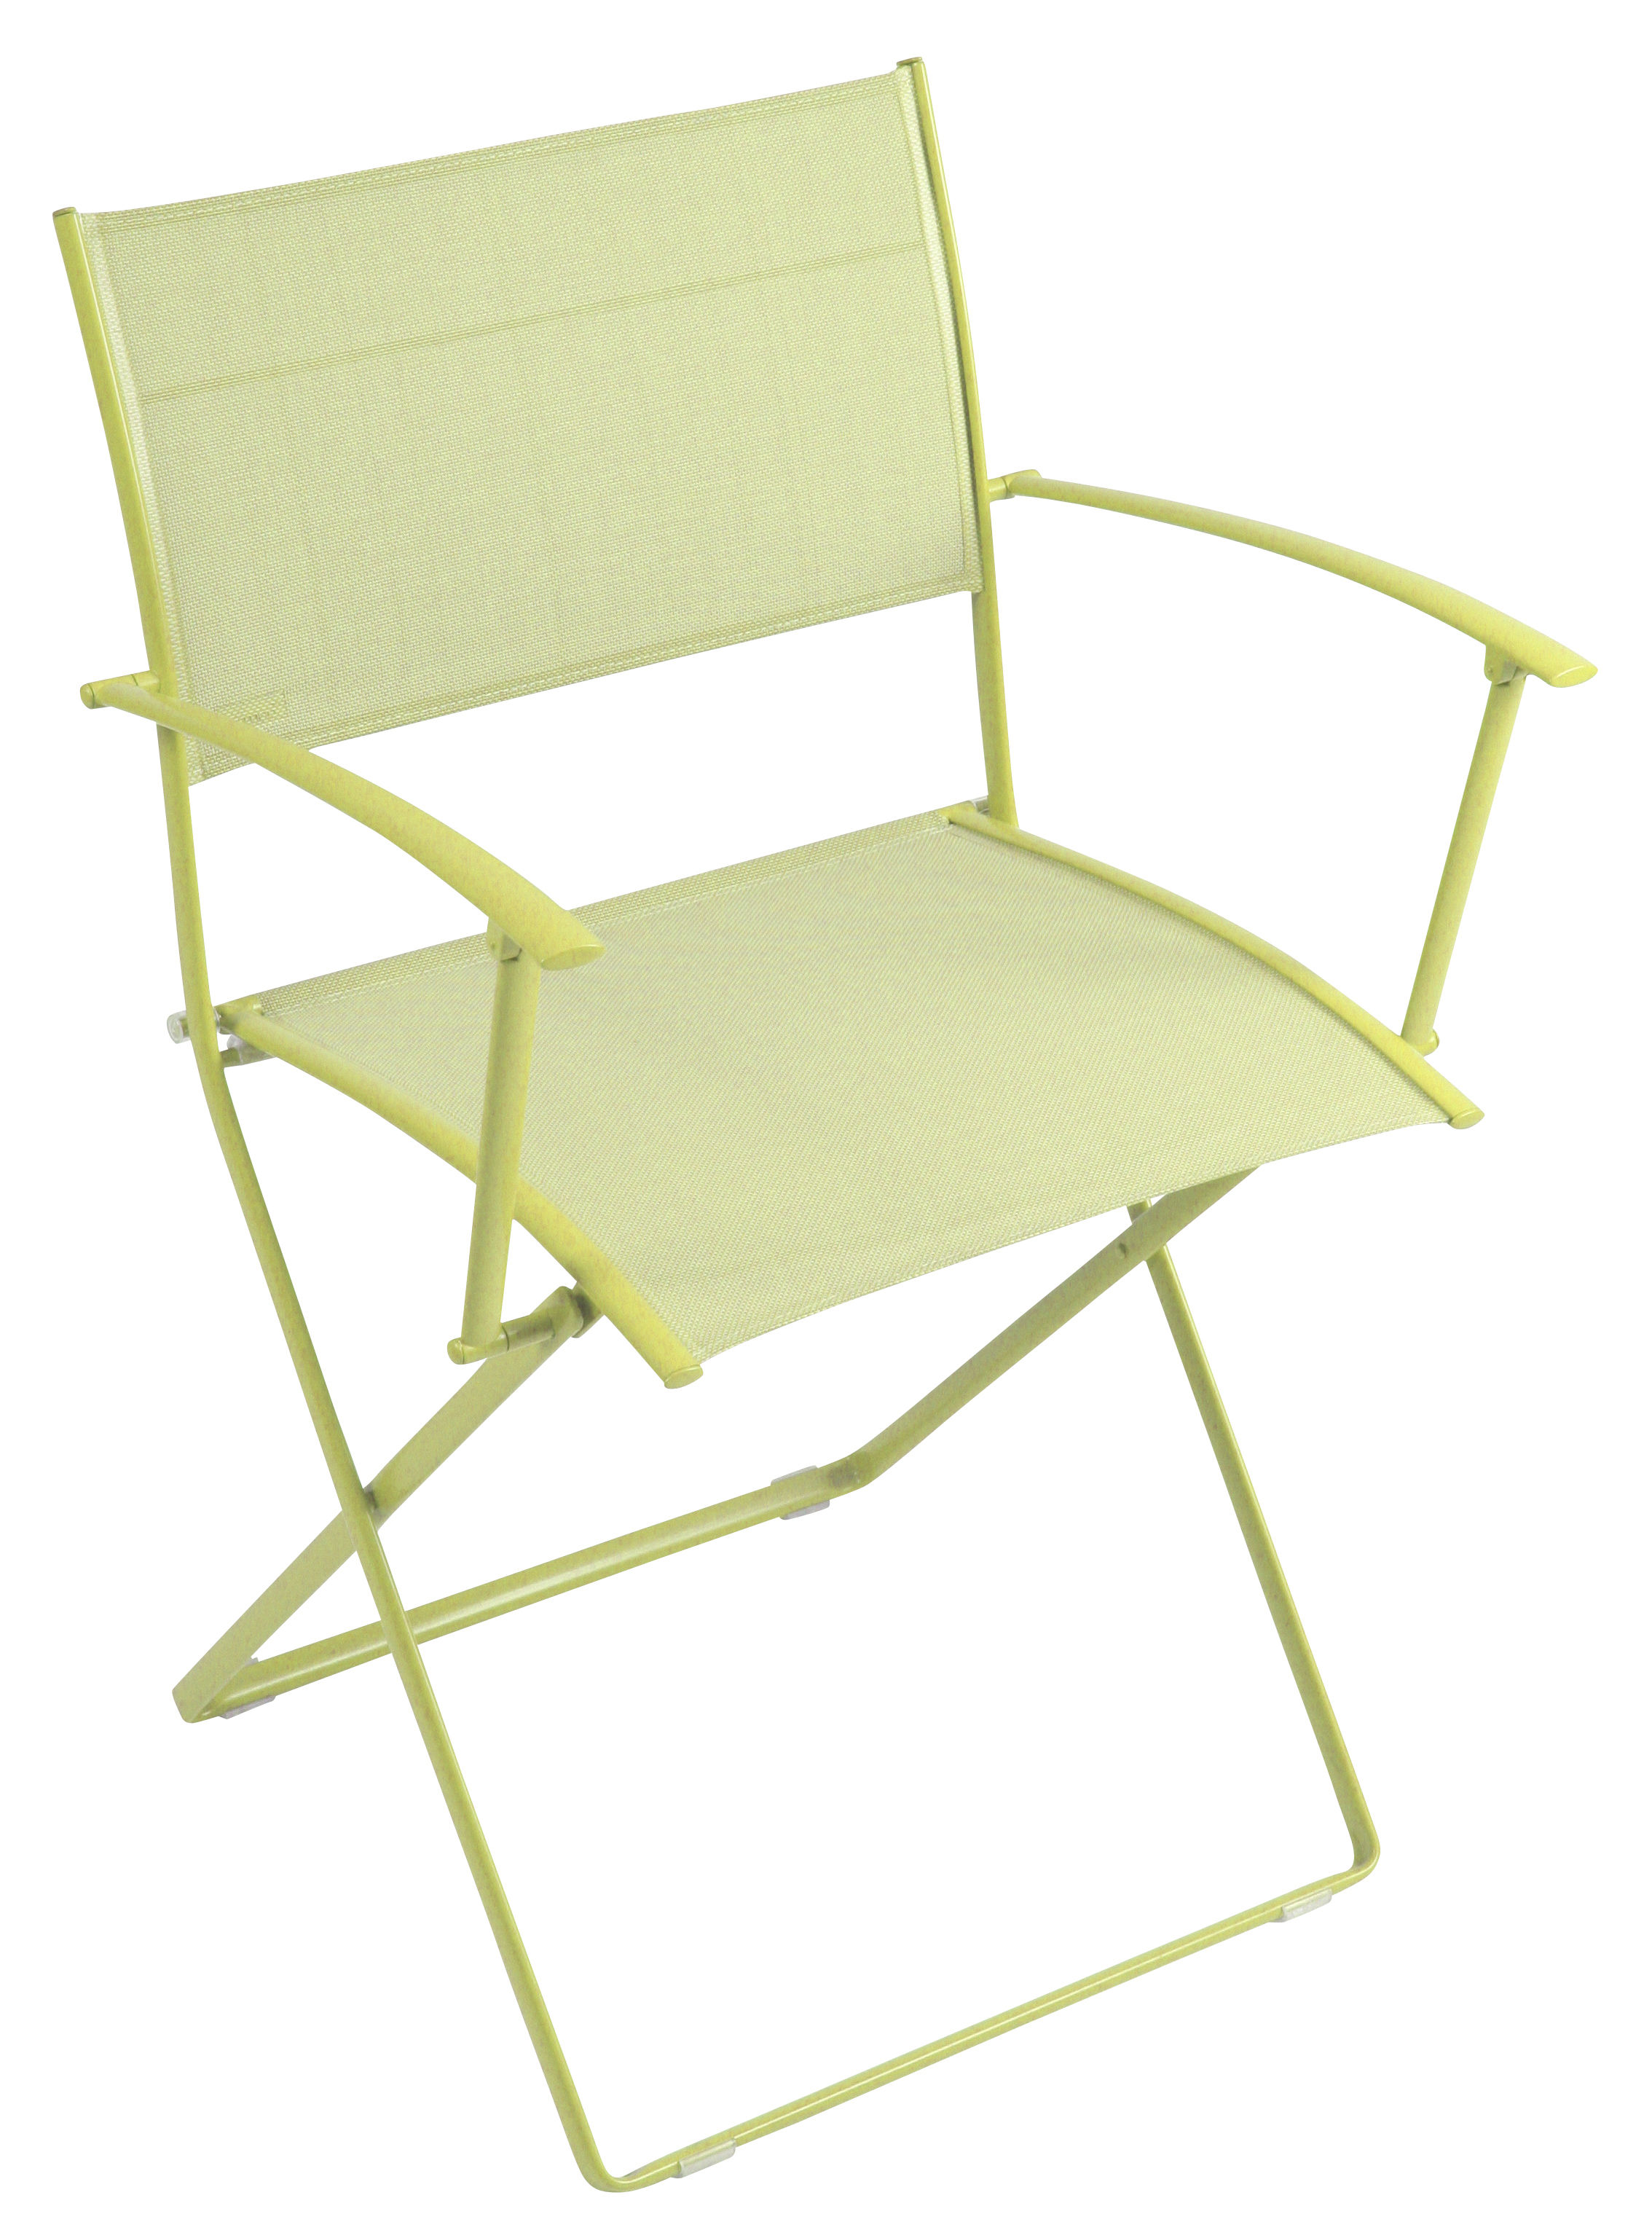 plein air fermob sessel. Black Bedroom Furniture Sets. Home Design Ideas